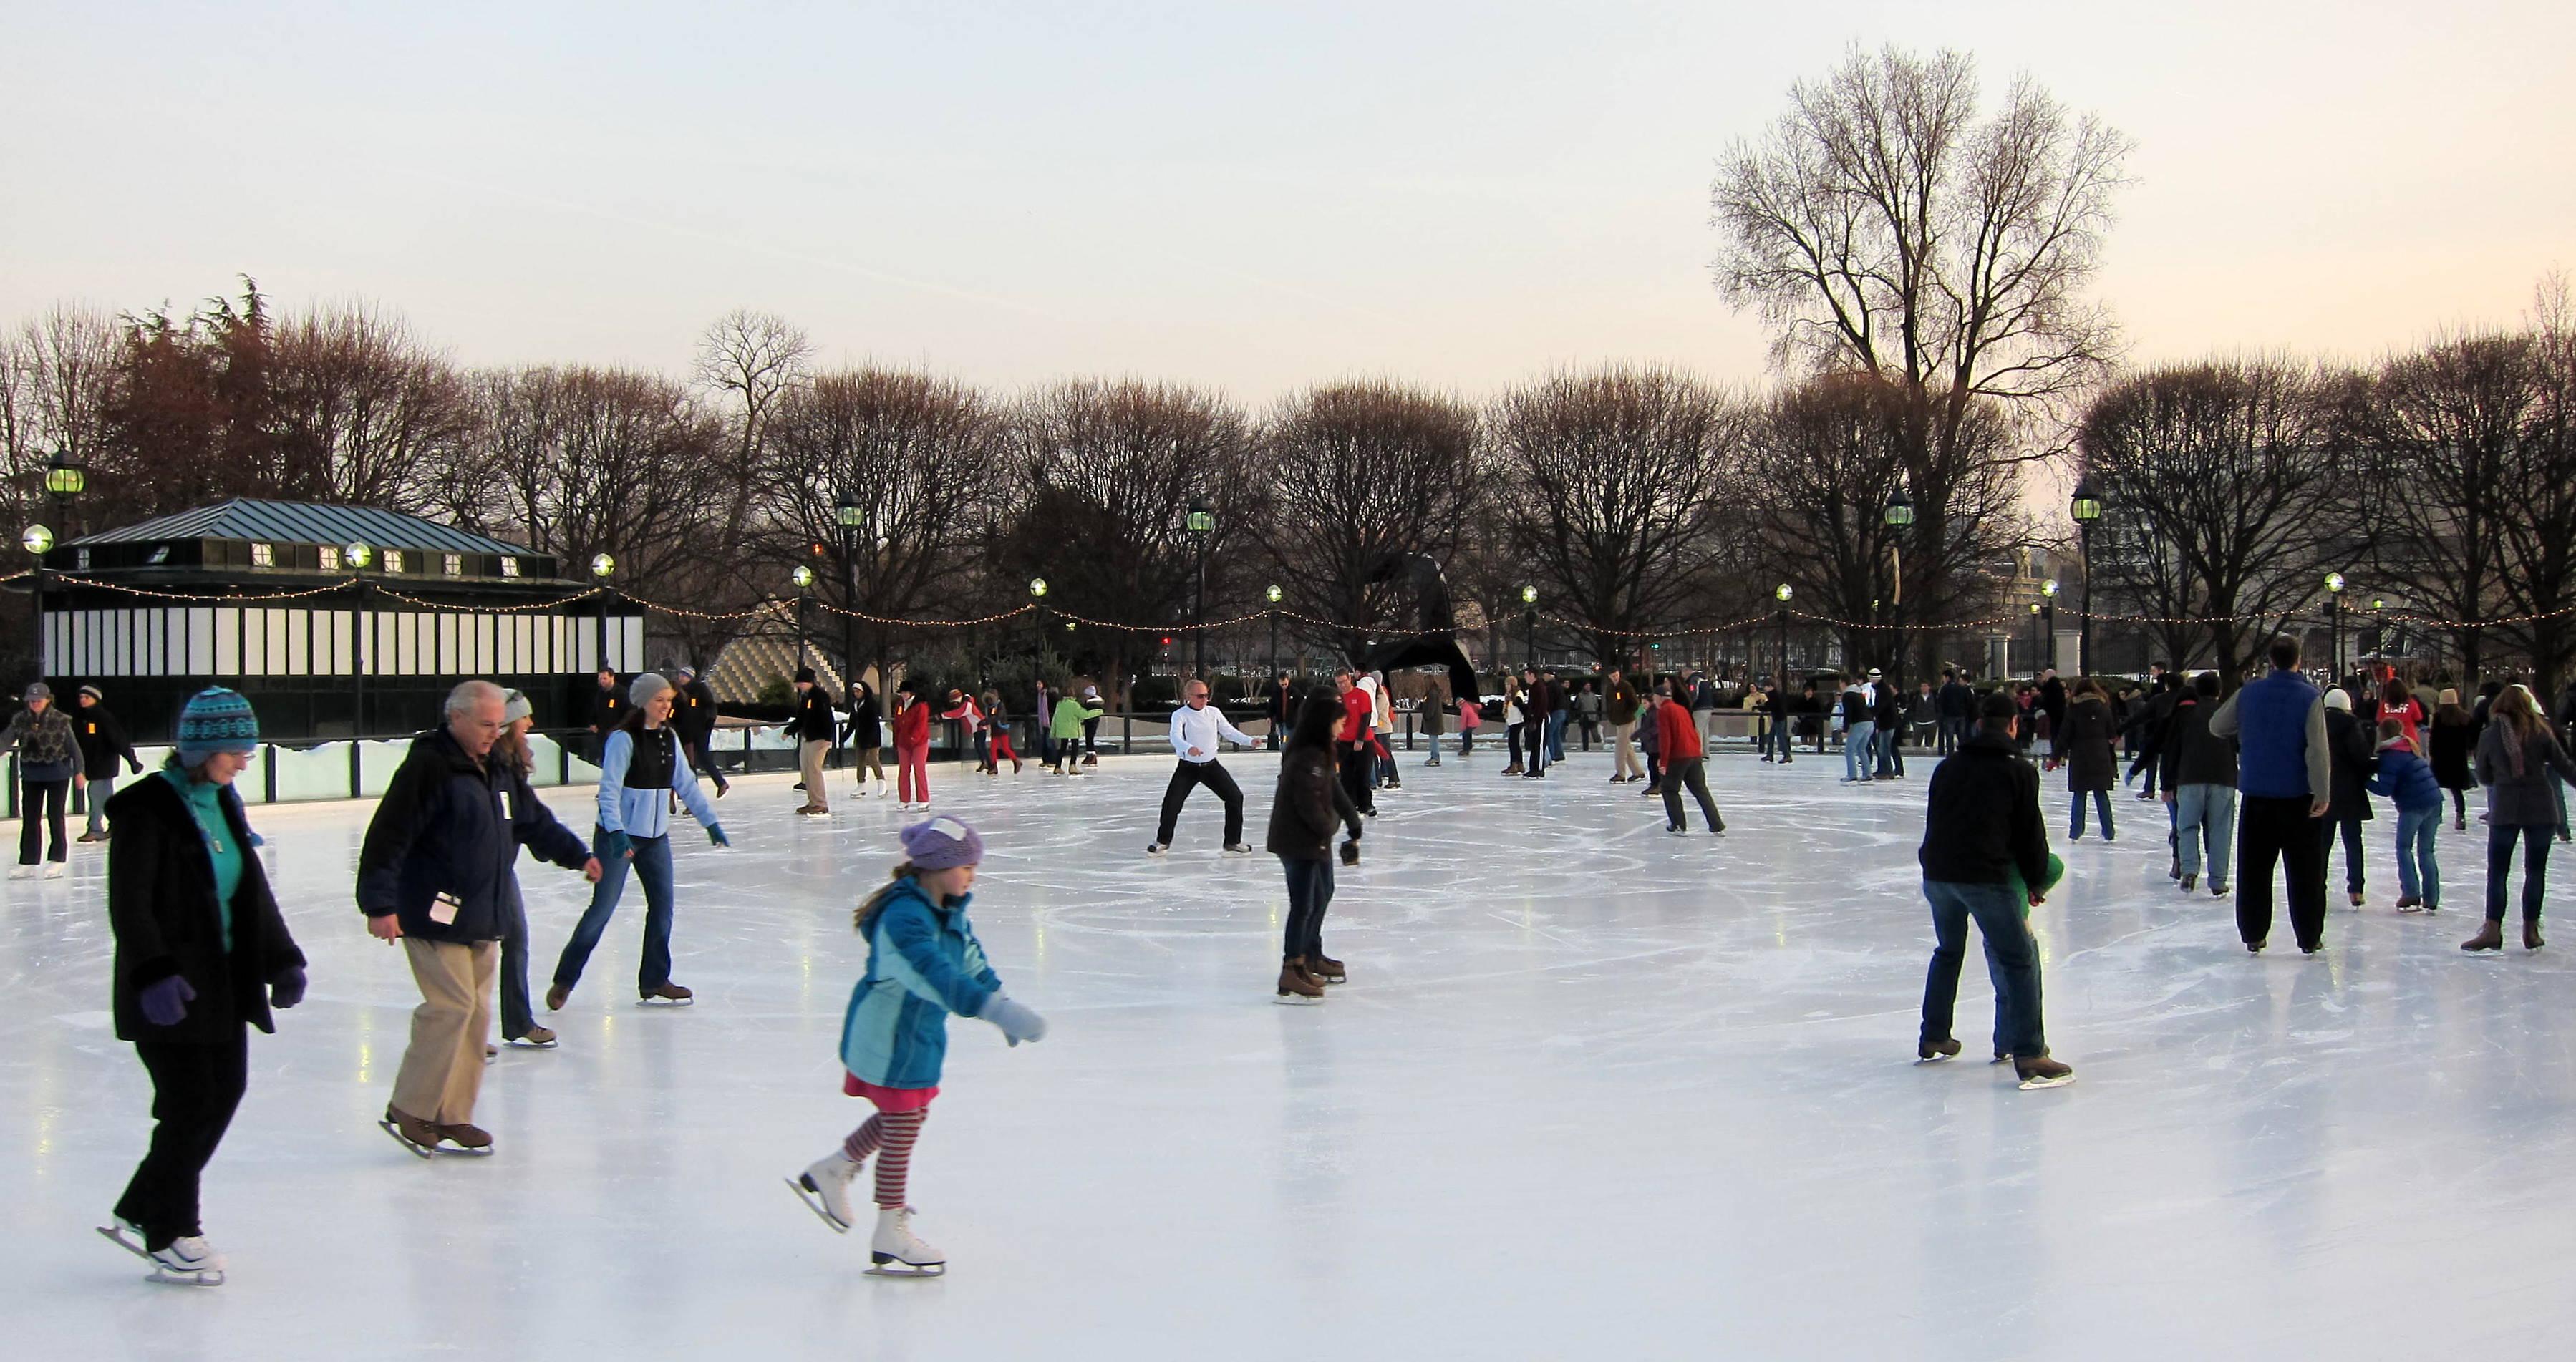 National Gallery of Art Sculpture Garden Ice Rink JPG